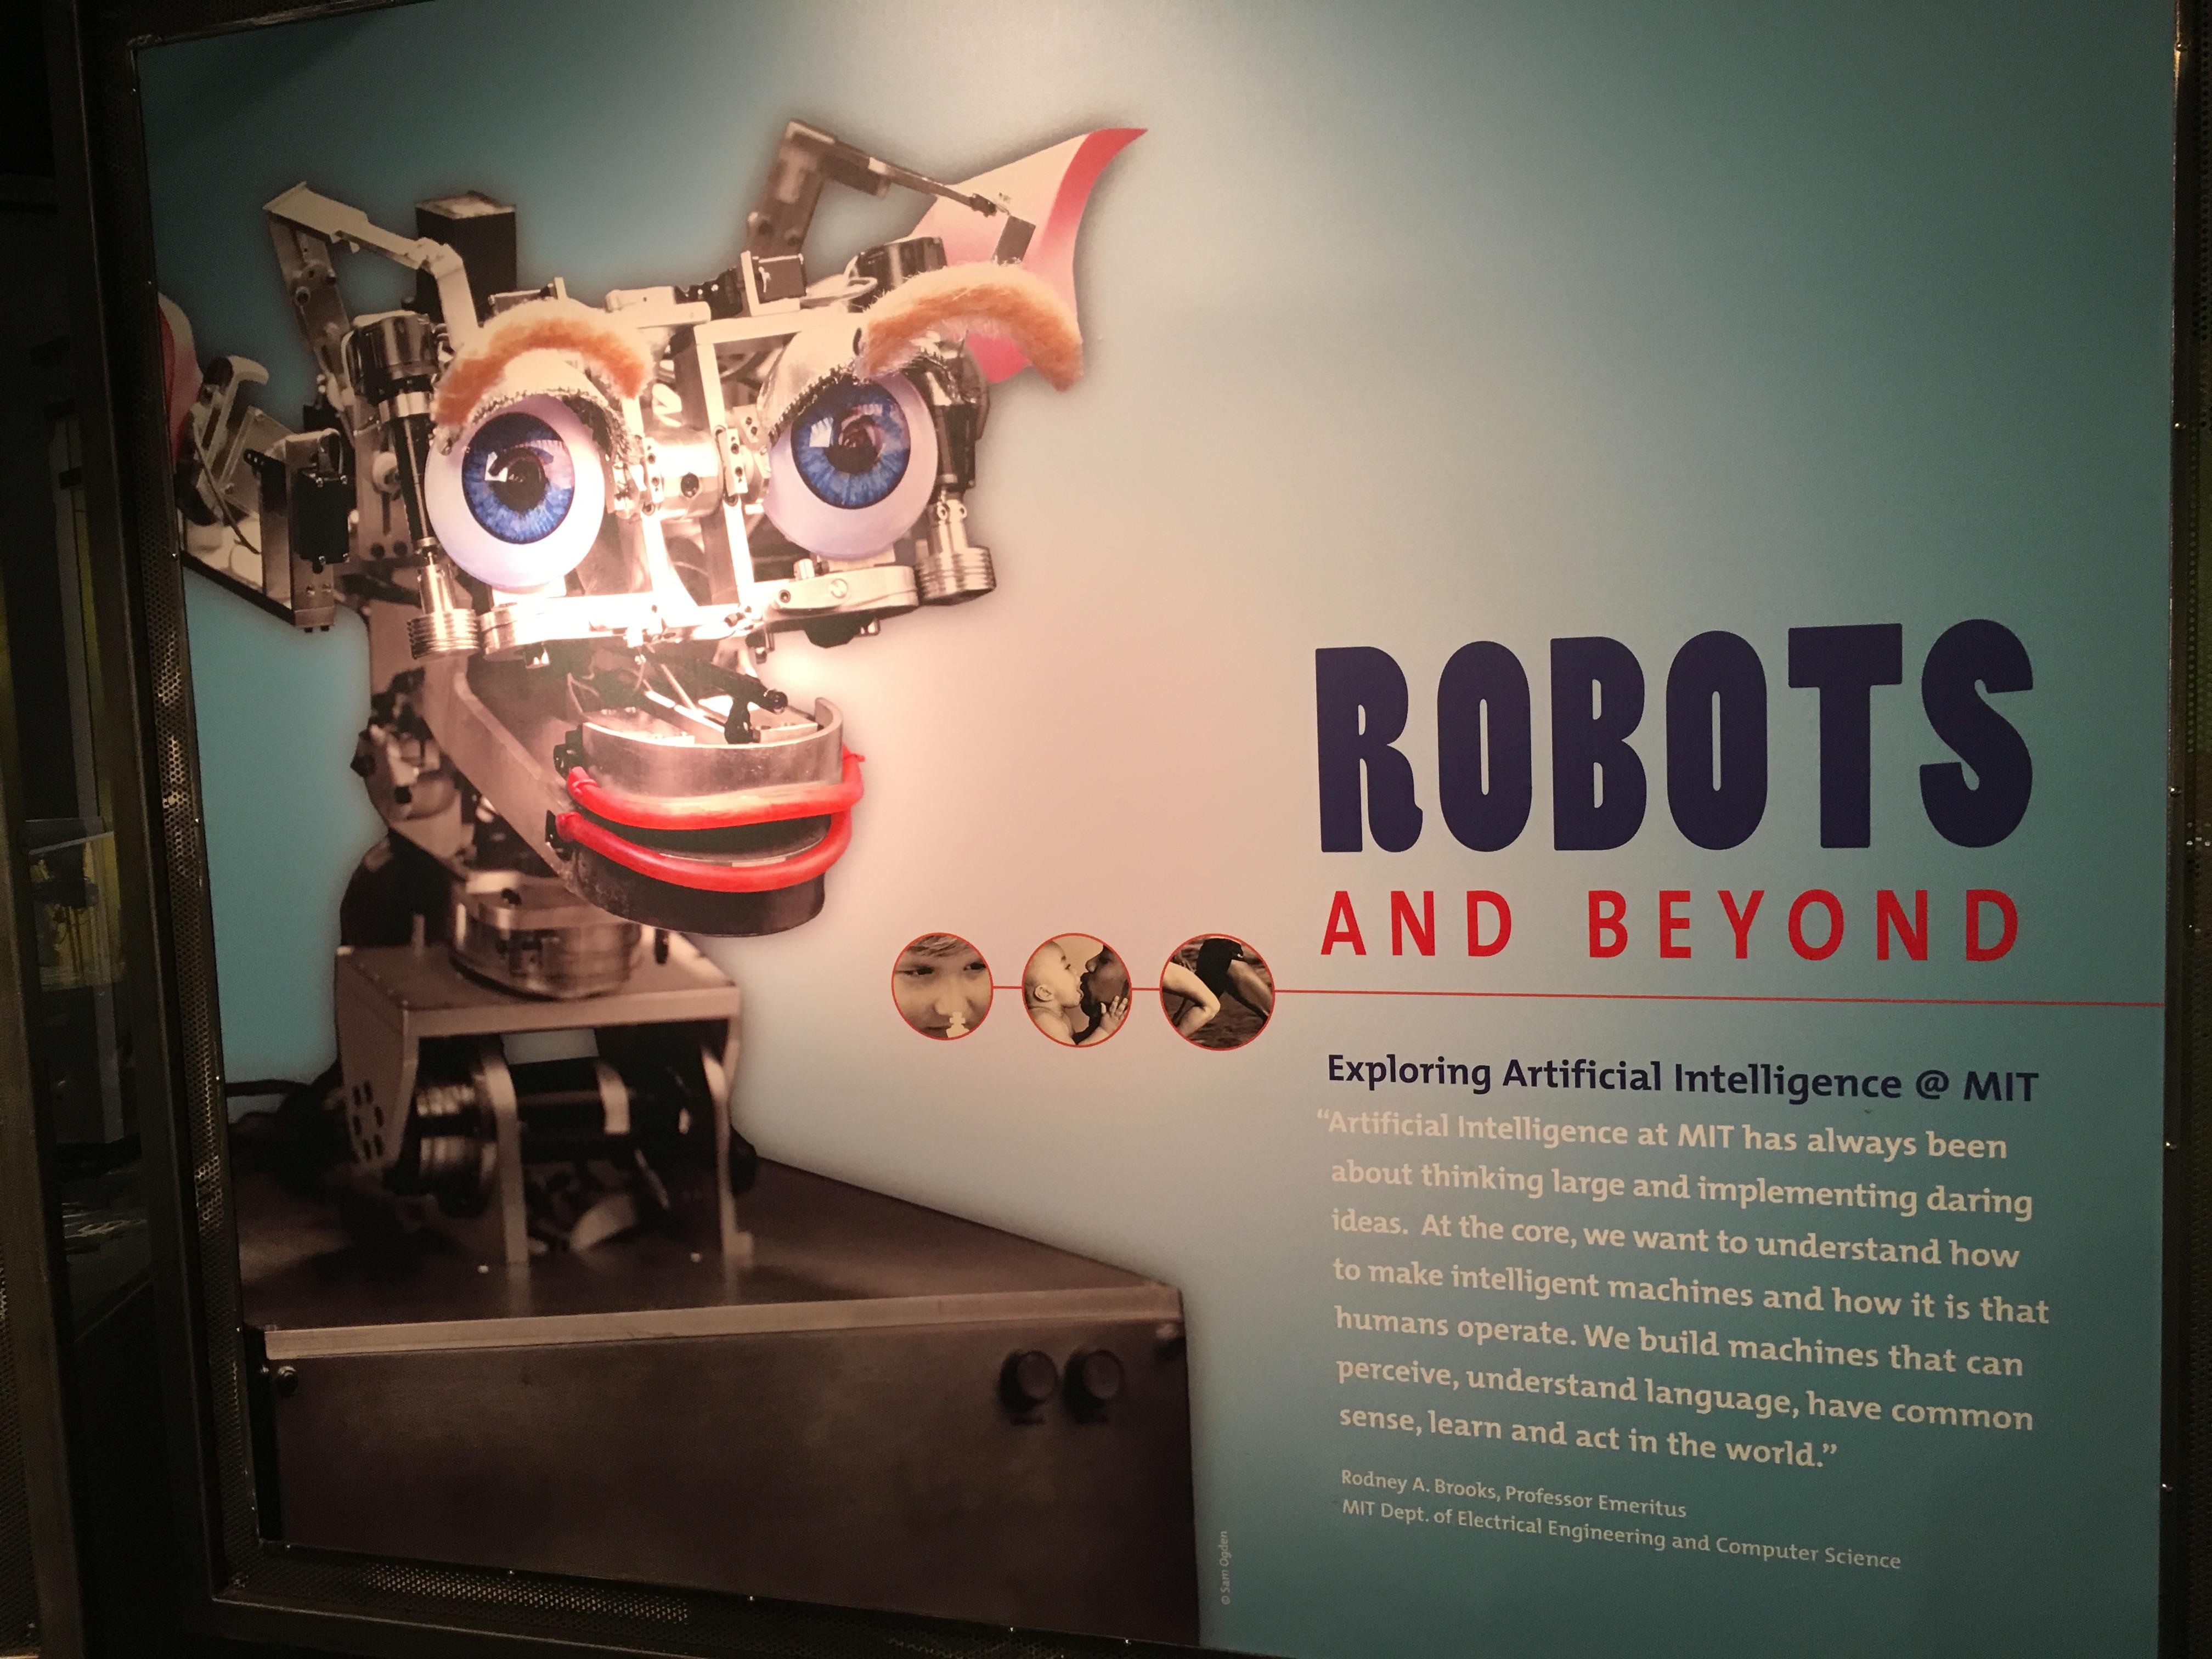 Mit Museum Robot Exhibit Virtual Tour